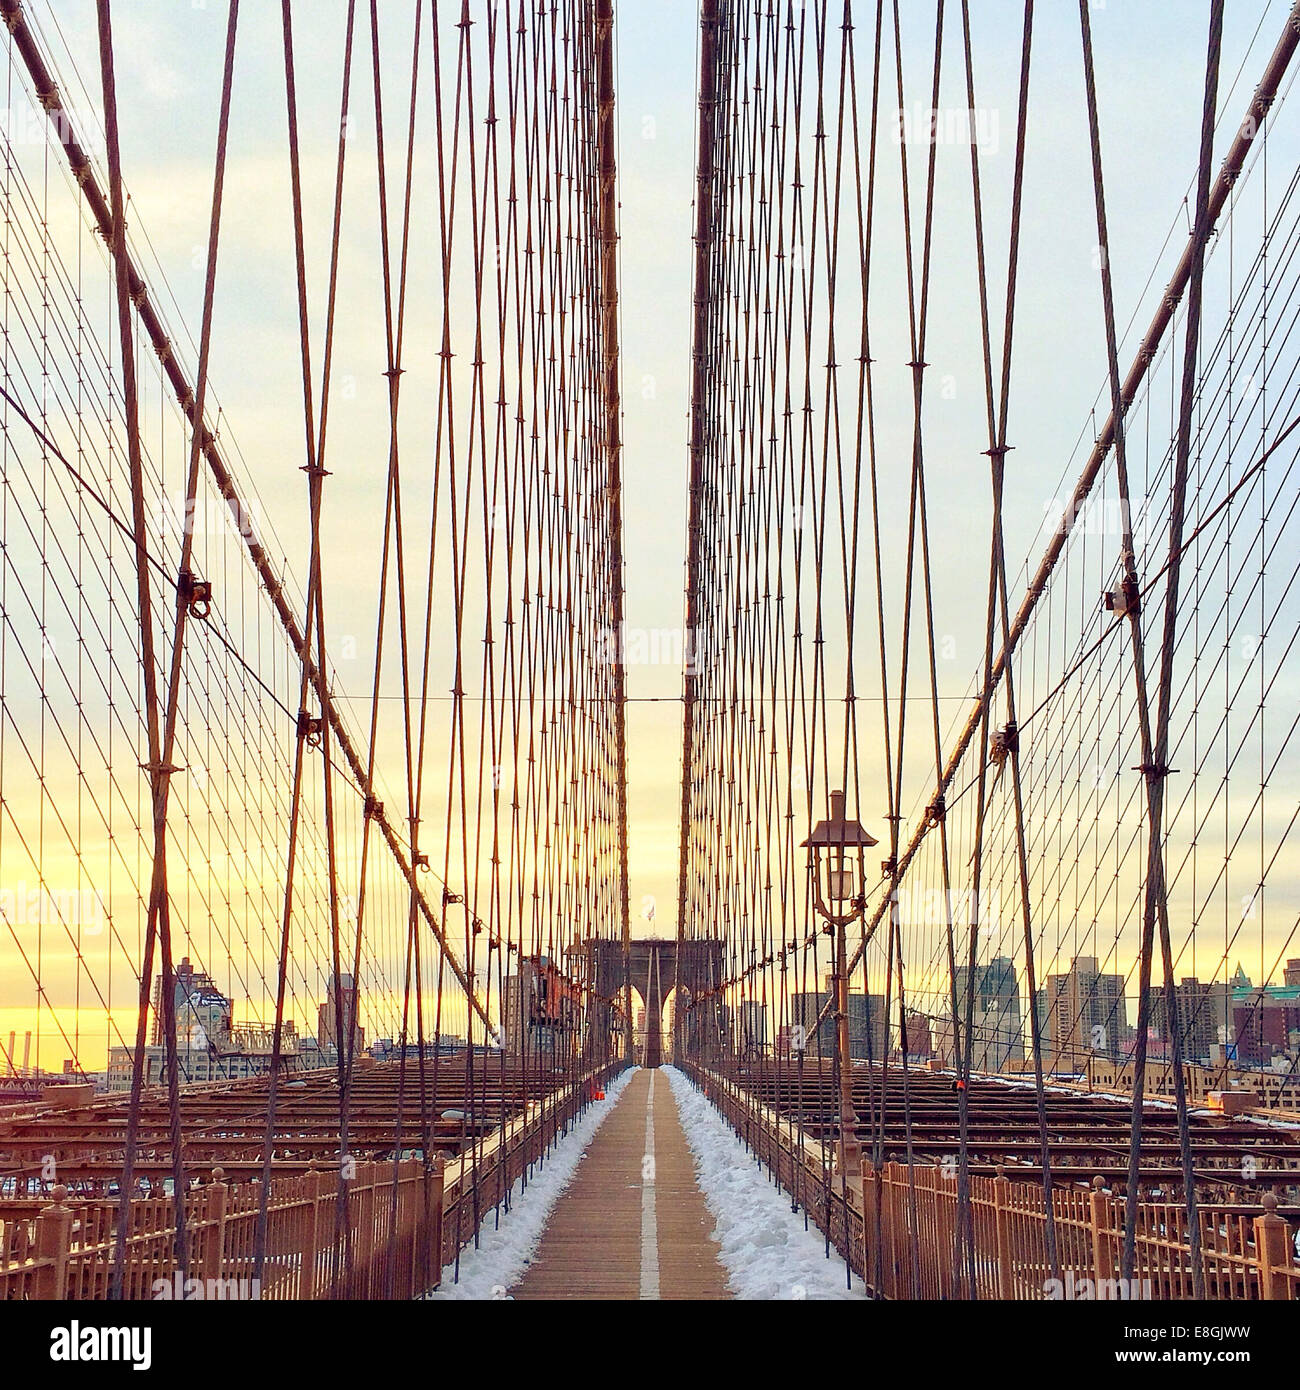 Brooklyn bridge at sunset, New York, America, USA - Stock Image